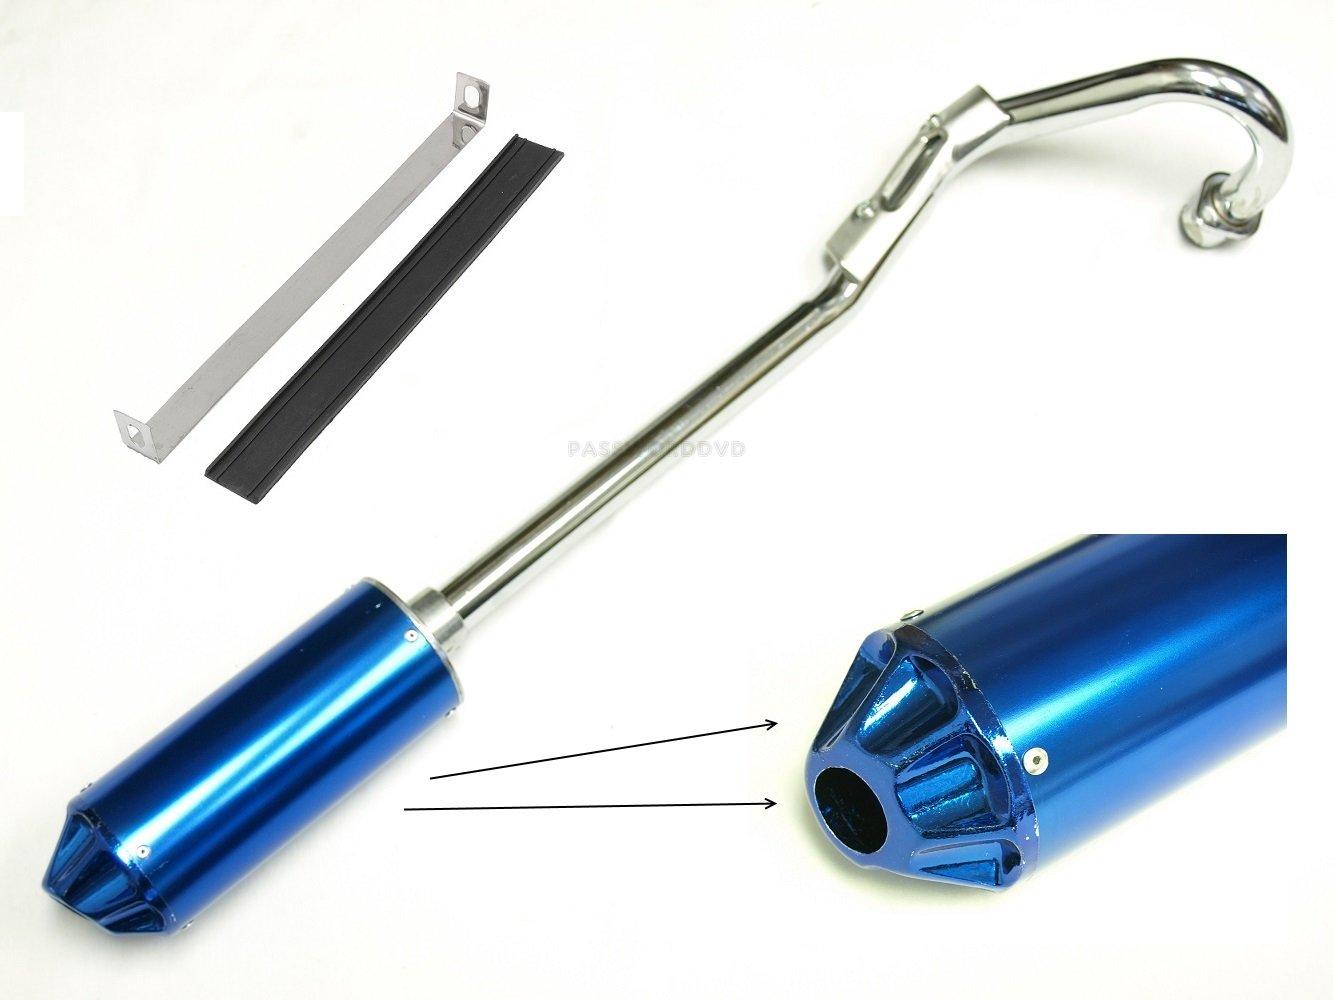 NEWANIME(R) HIGH PERFORMANCE ALL BLUE EXHAUST PIPE MUFFLER HONDA XR50 CRF50 SDG SSR 110 125cc